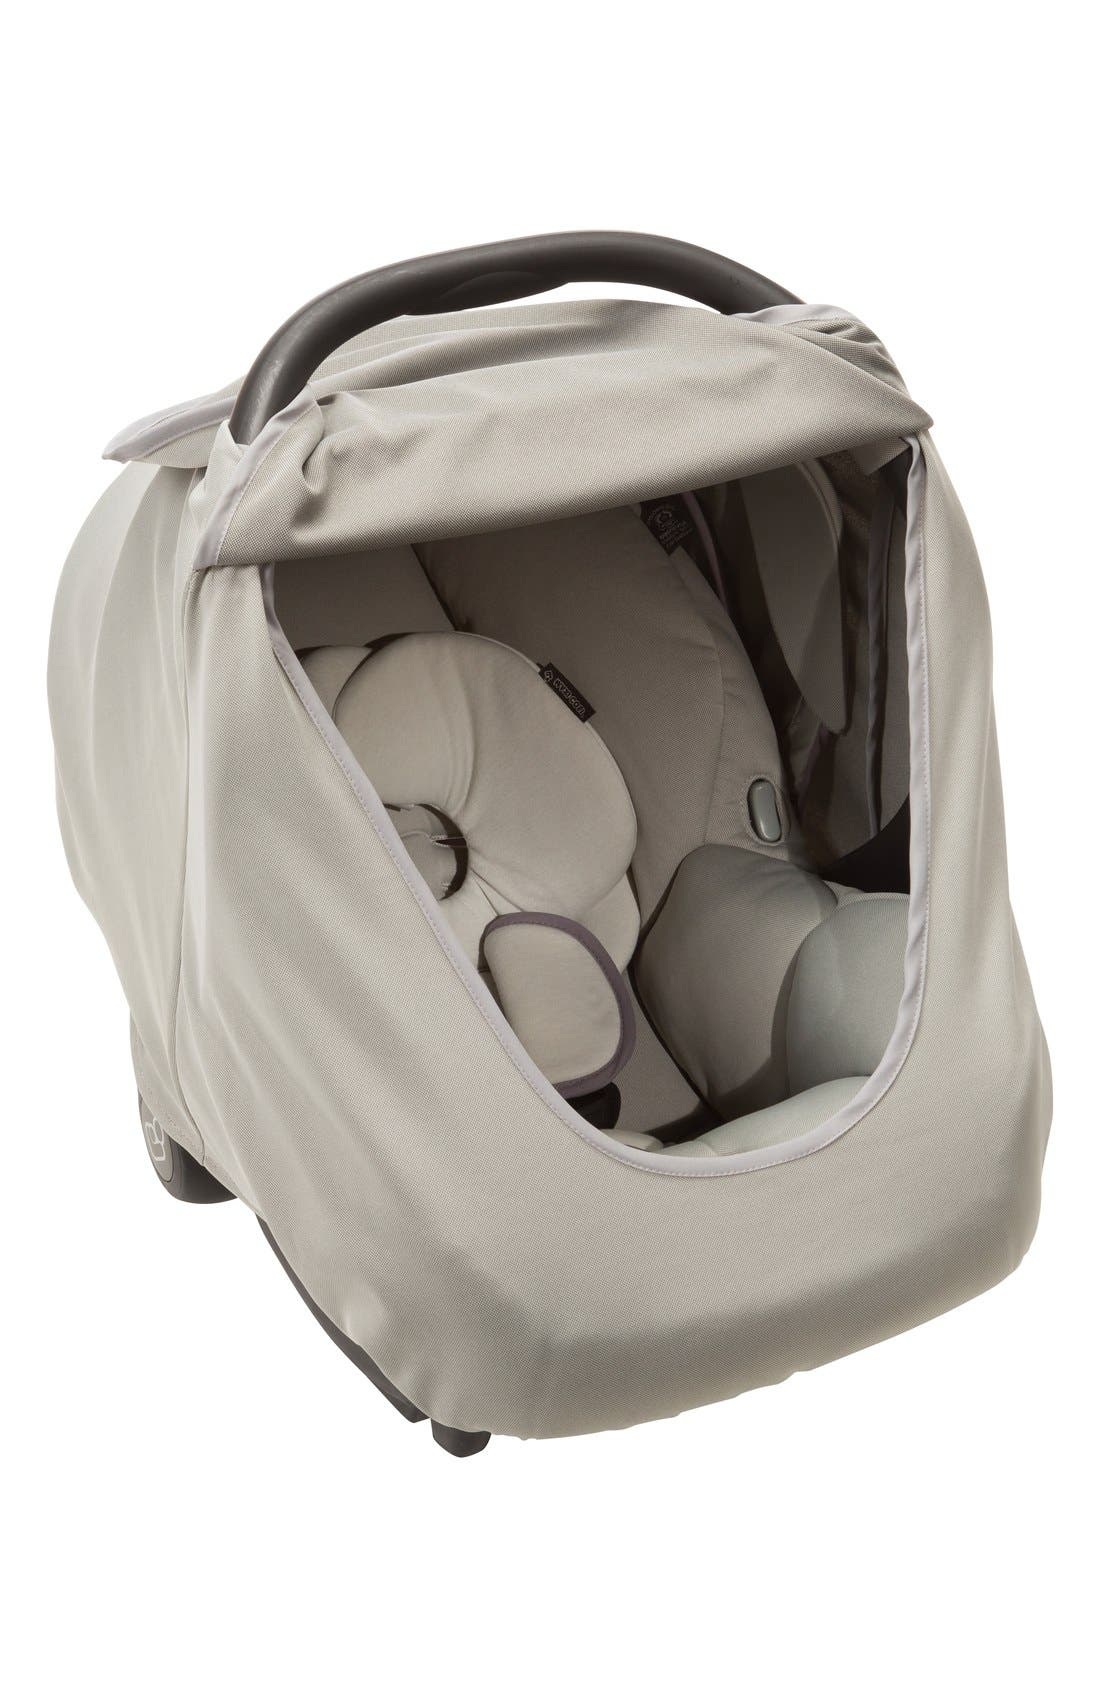 MAXI-COSI® Cover for Mico Car Seat